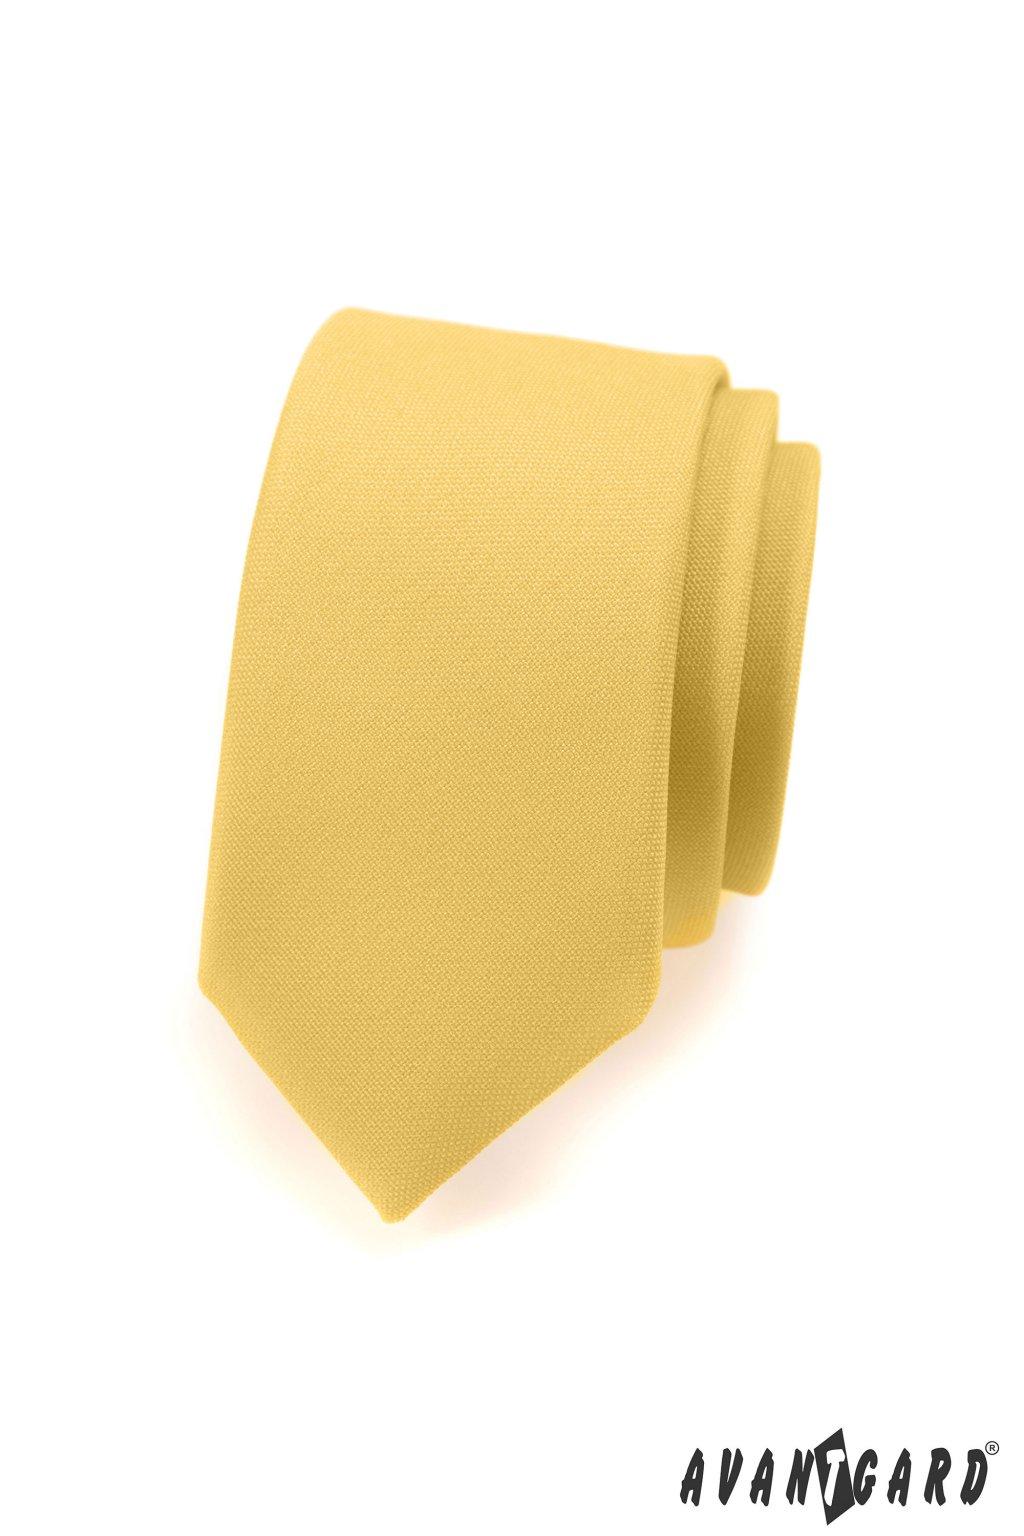 Kravata SLIM AVANTGARD LUX žlutá 571 - 9826